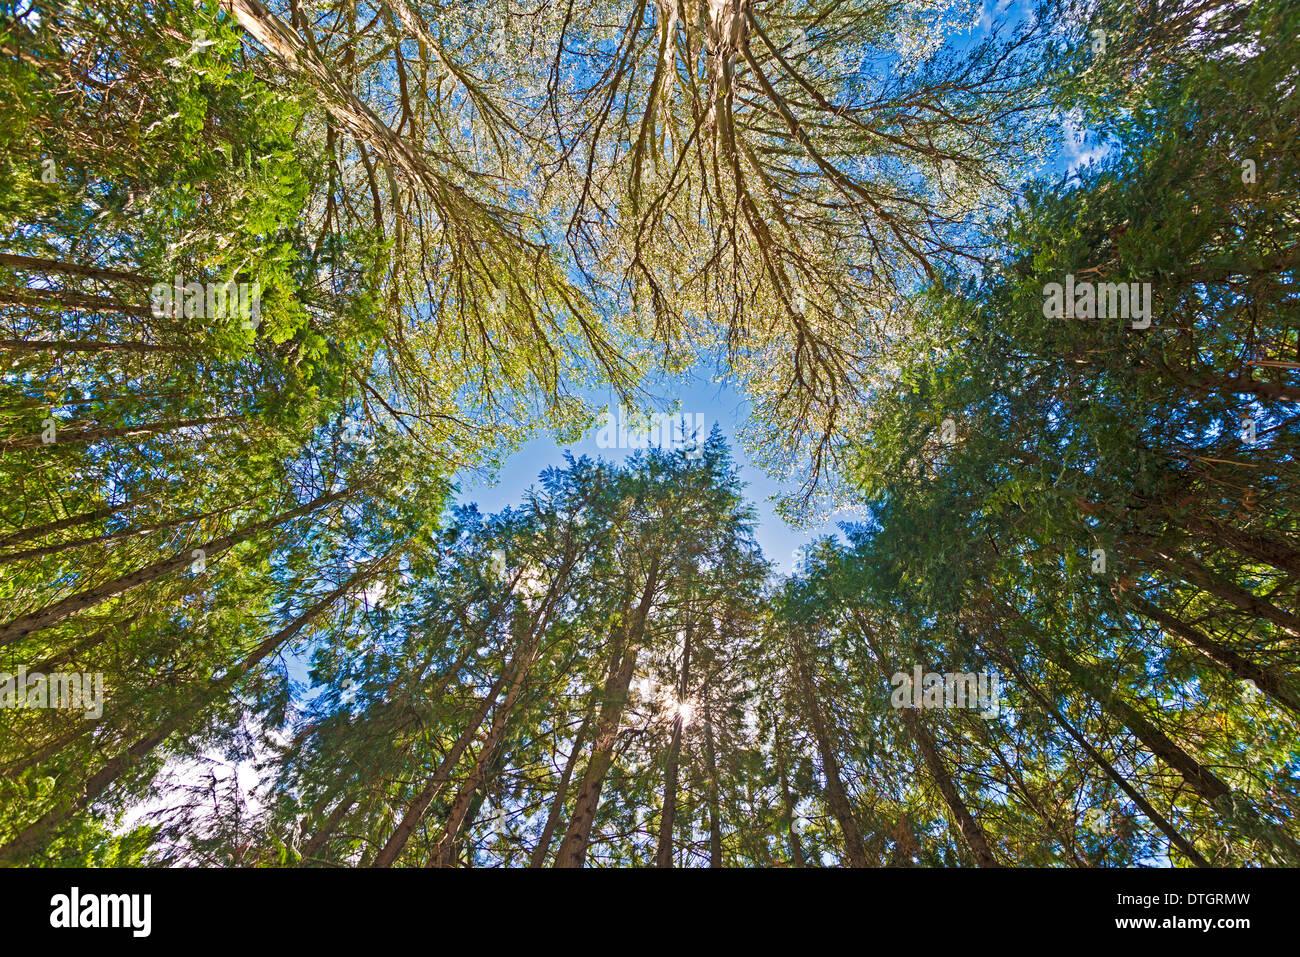 Canopy of giant Eucalyptus trees, Australian Oaks (Eucalyptus regnans), Eastwoodhill, National Arboretum, near Gisborne - Stock Image